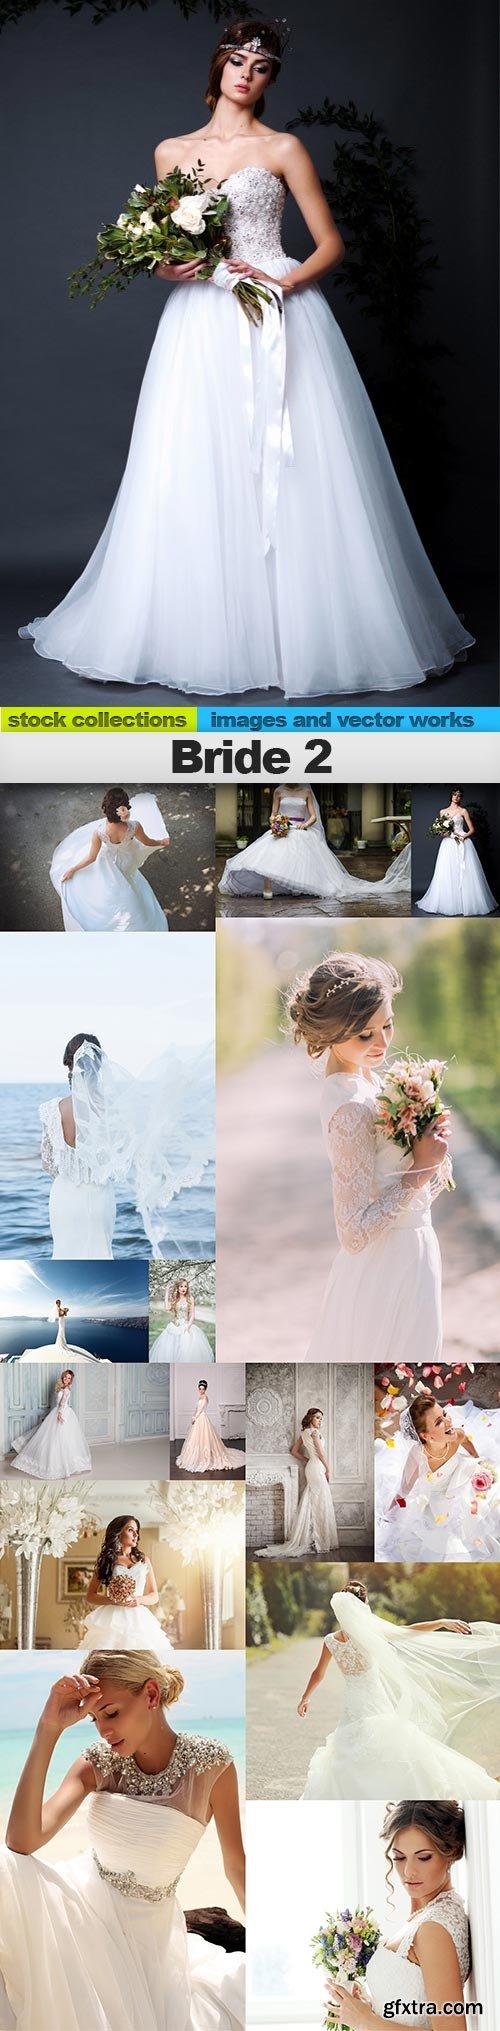 Bride 2, 15 x UHQ JPEG